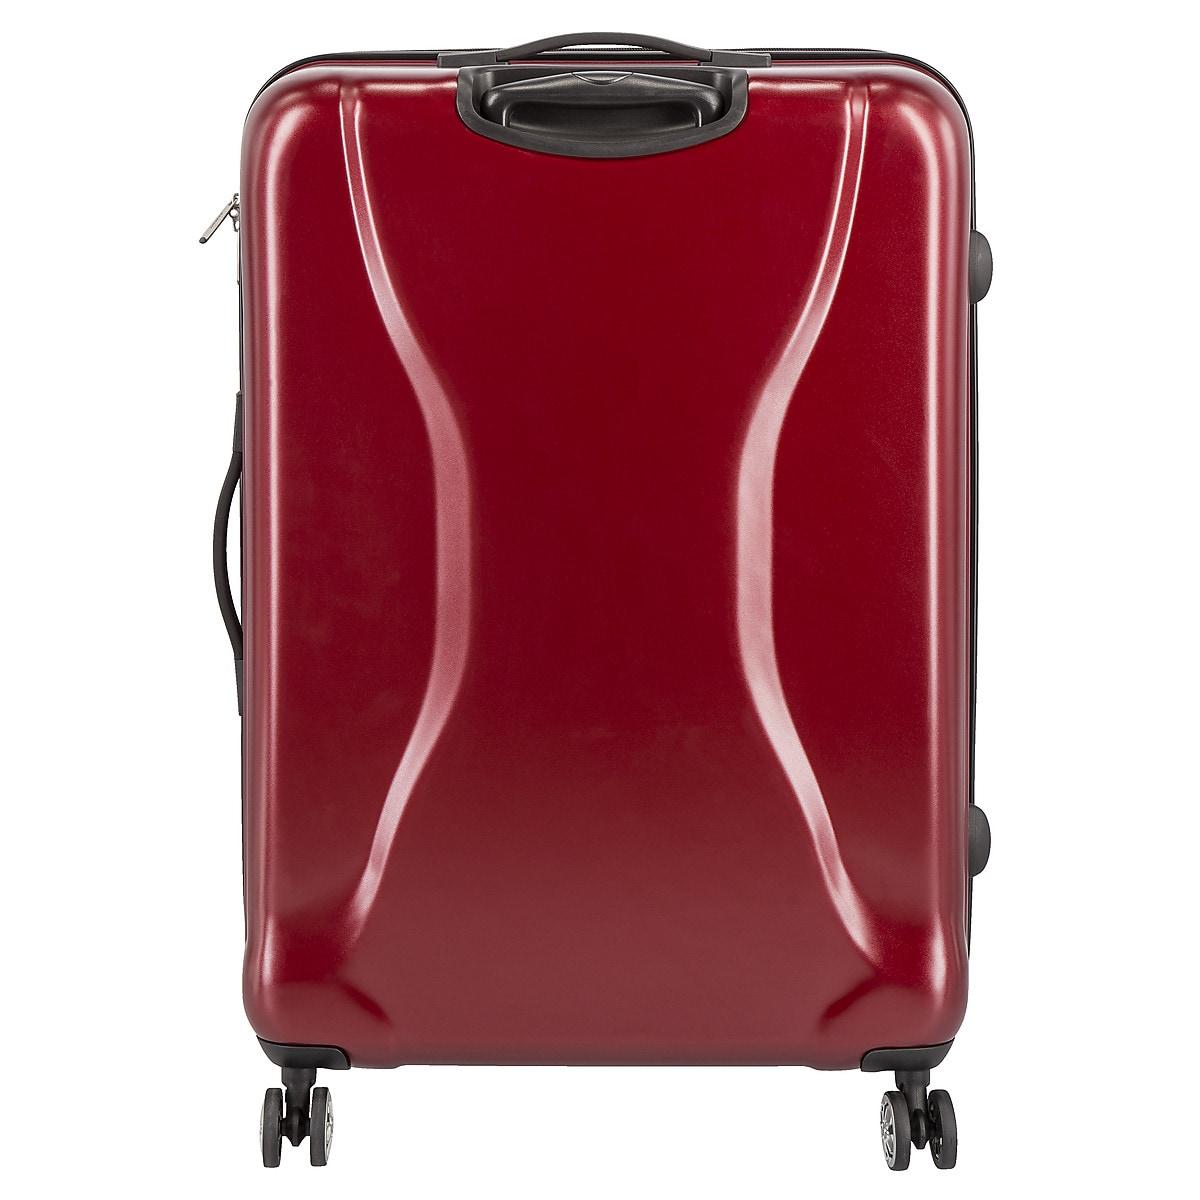 Asaklitt kofferter, 2-pack , rød